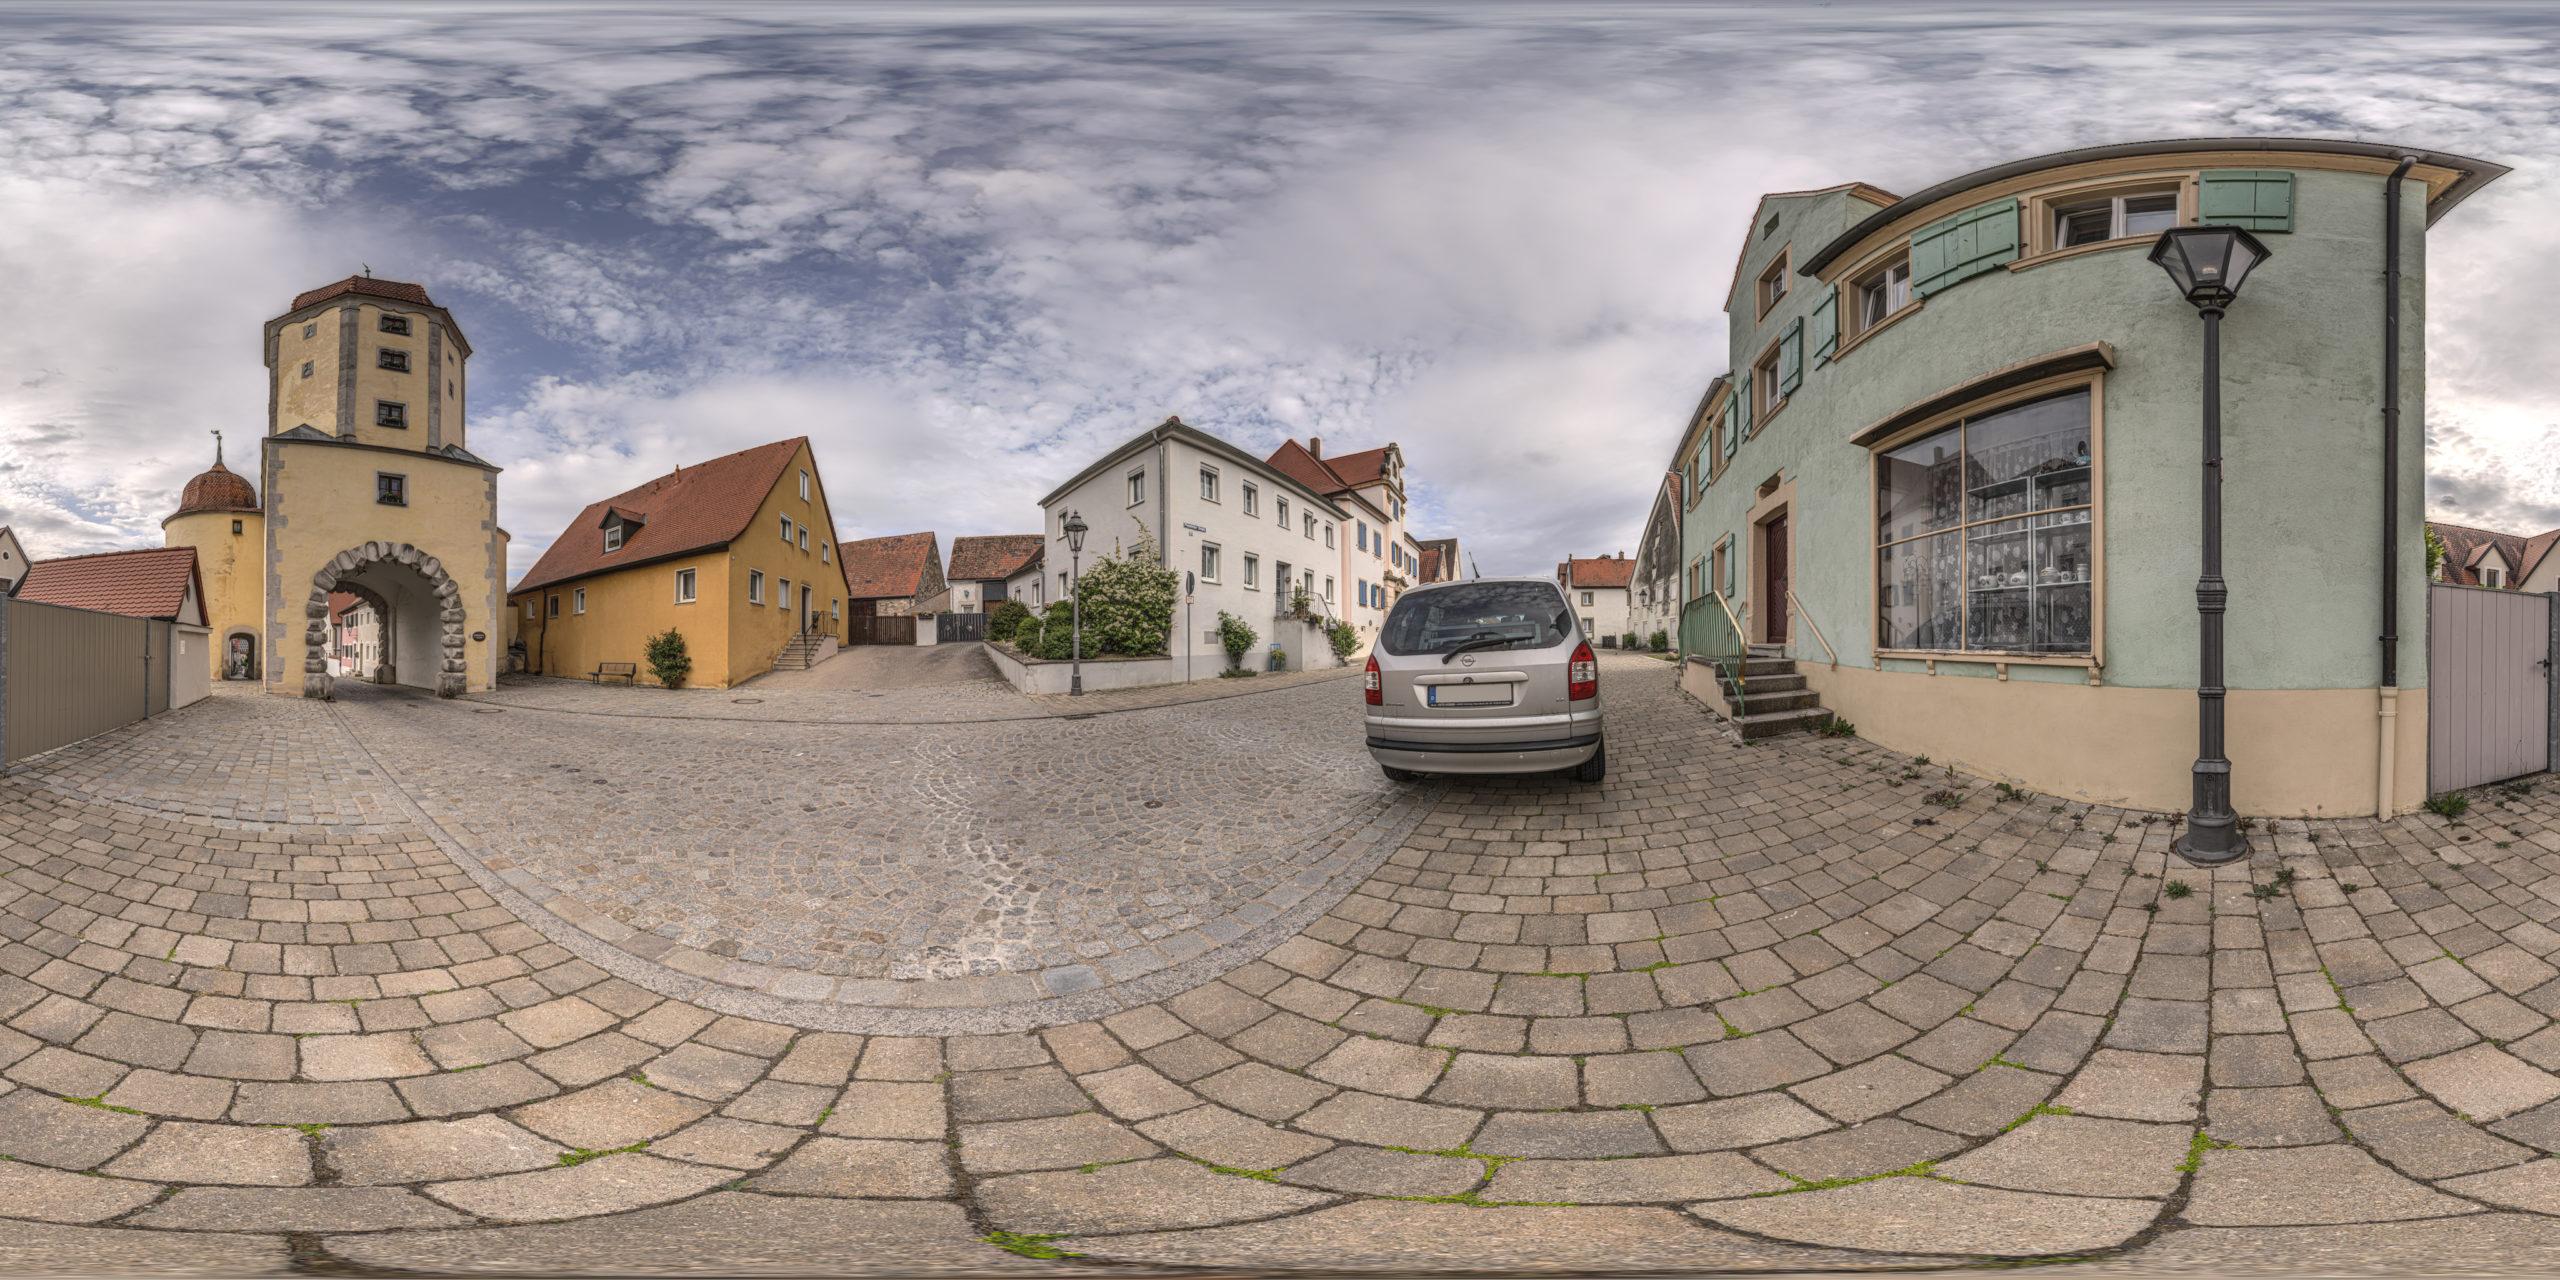 HDRI-Skies-Pleinfelder-Tor-Ellingen